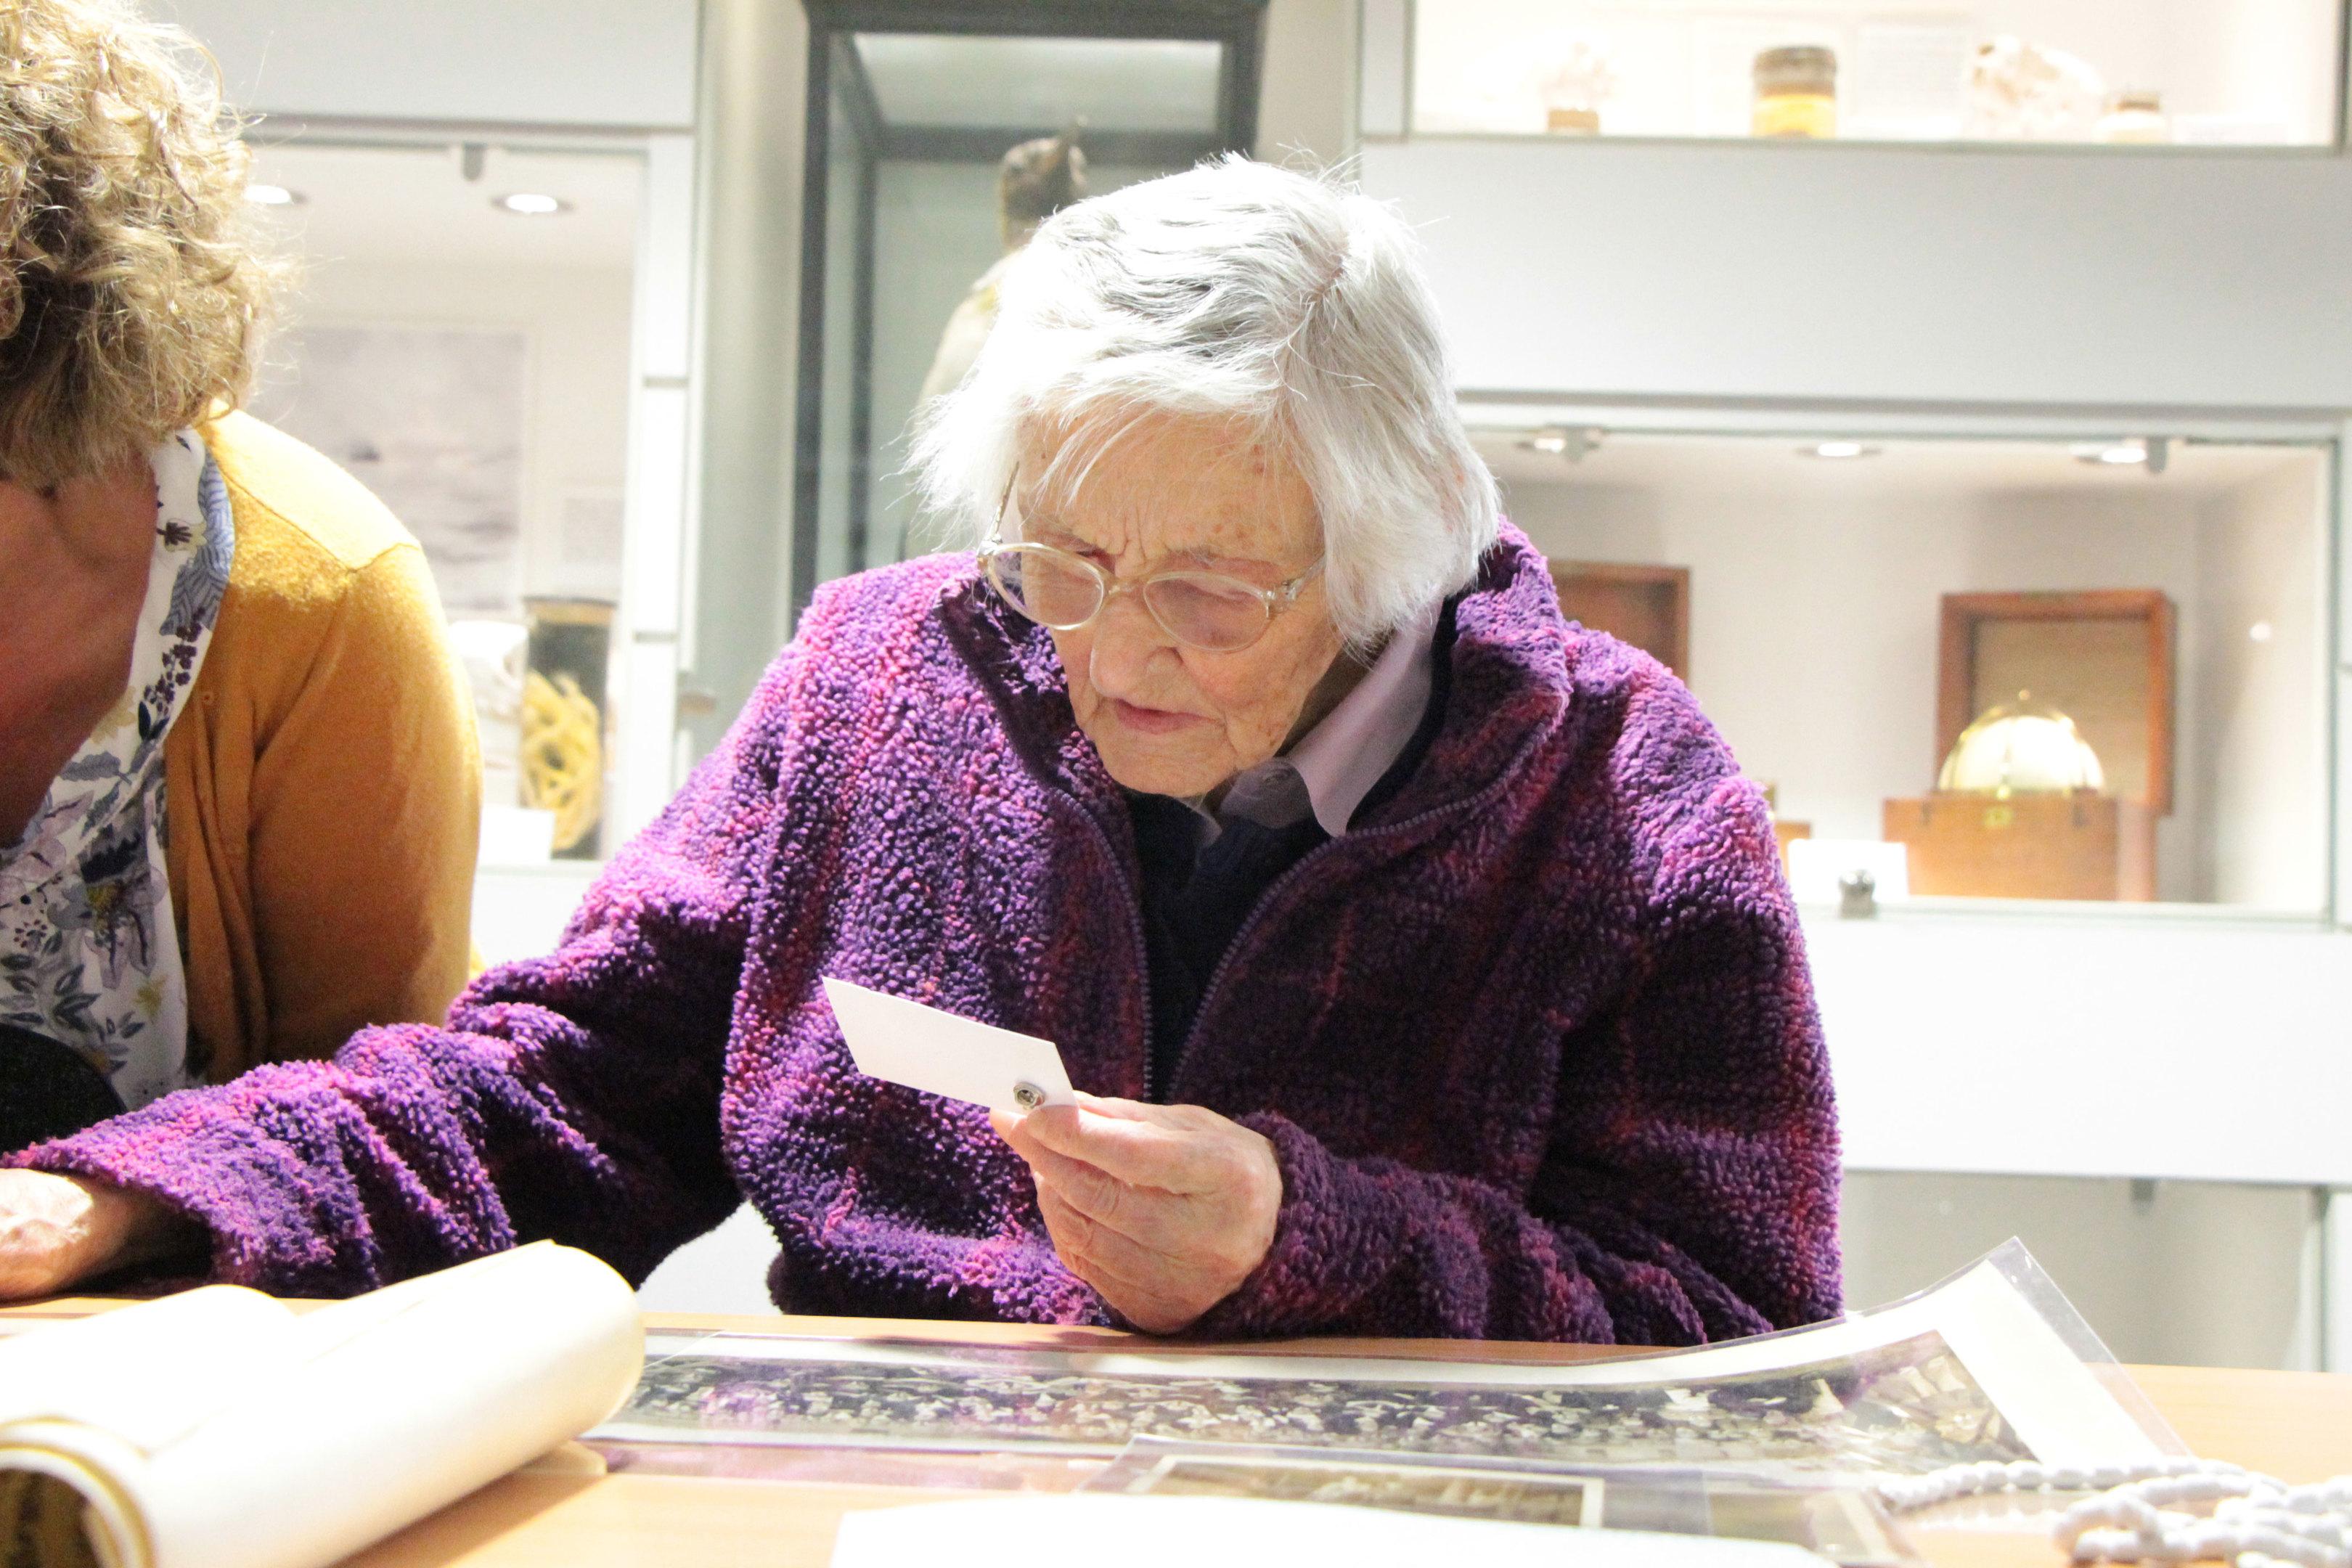 Mrs Walden visited the university's archives.